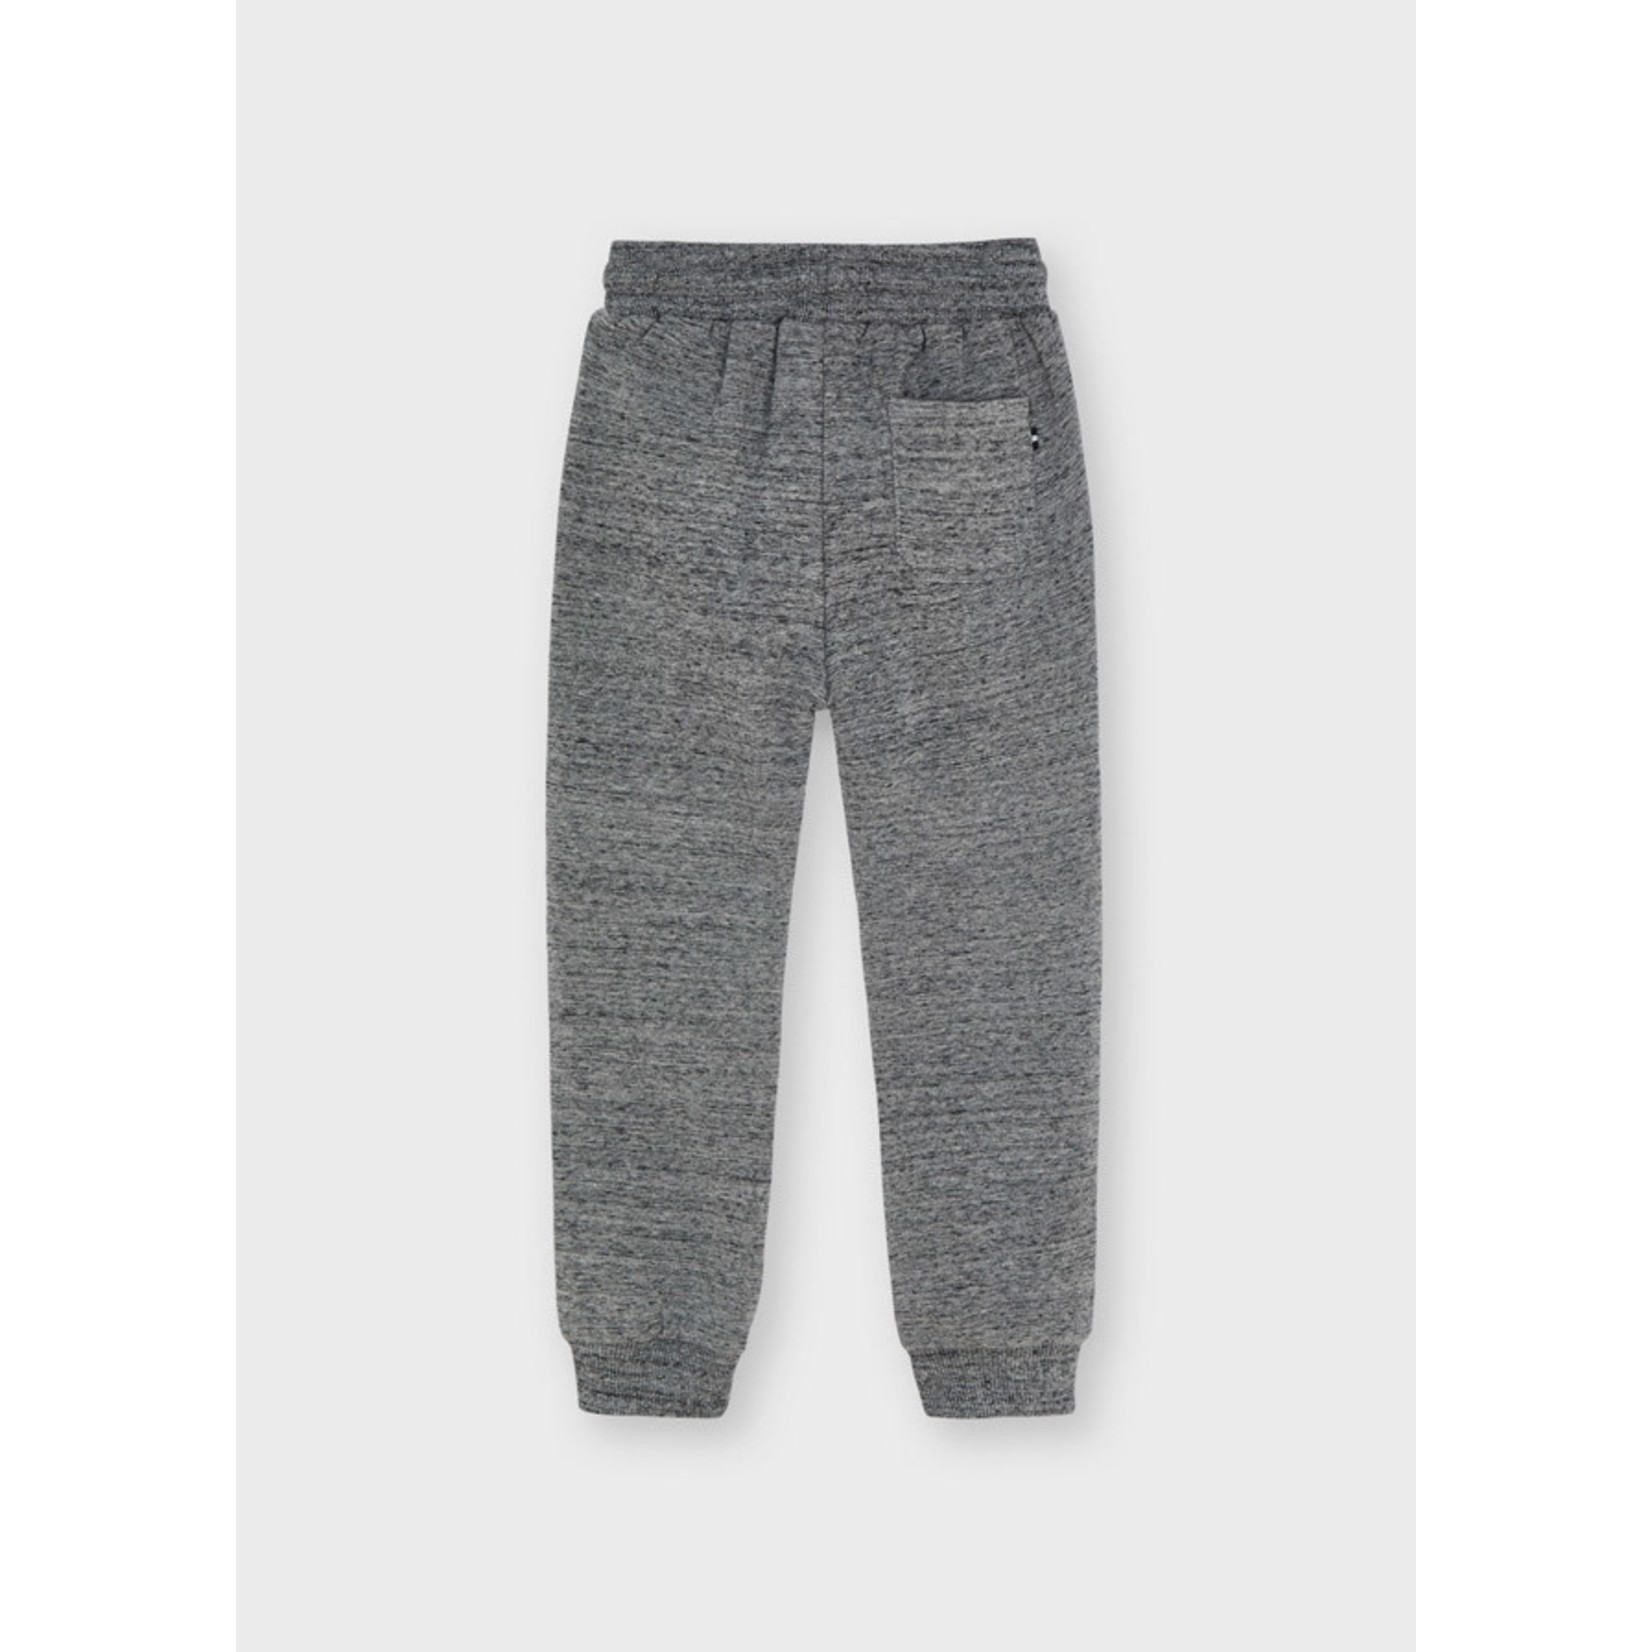 Mayoral Basic Cuffed Fleece Trousers, Gray